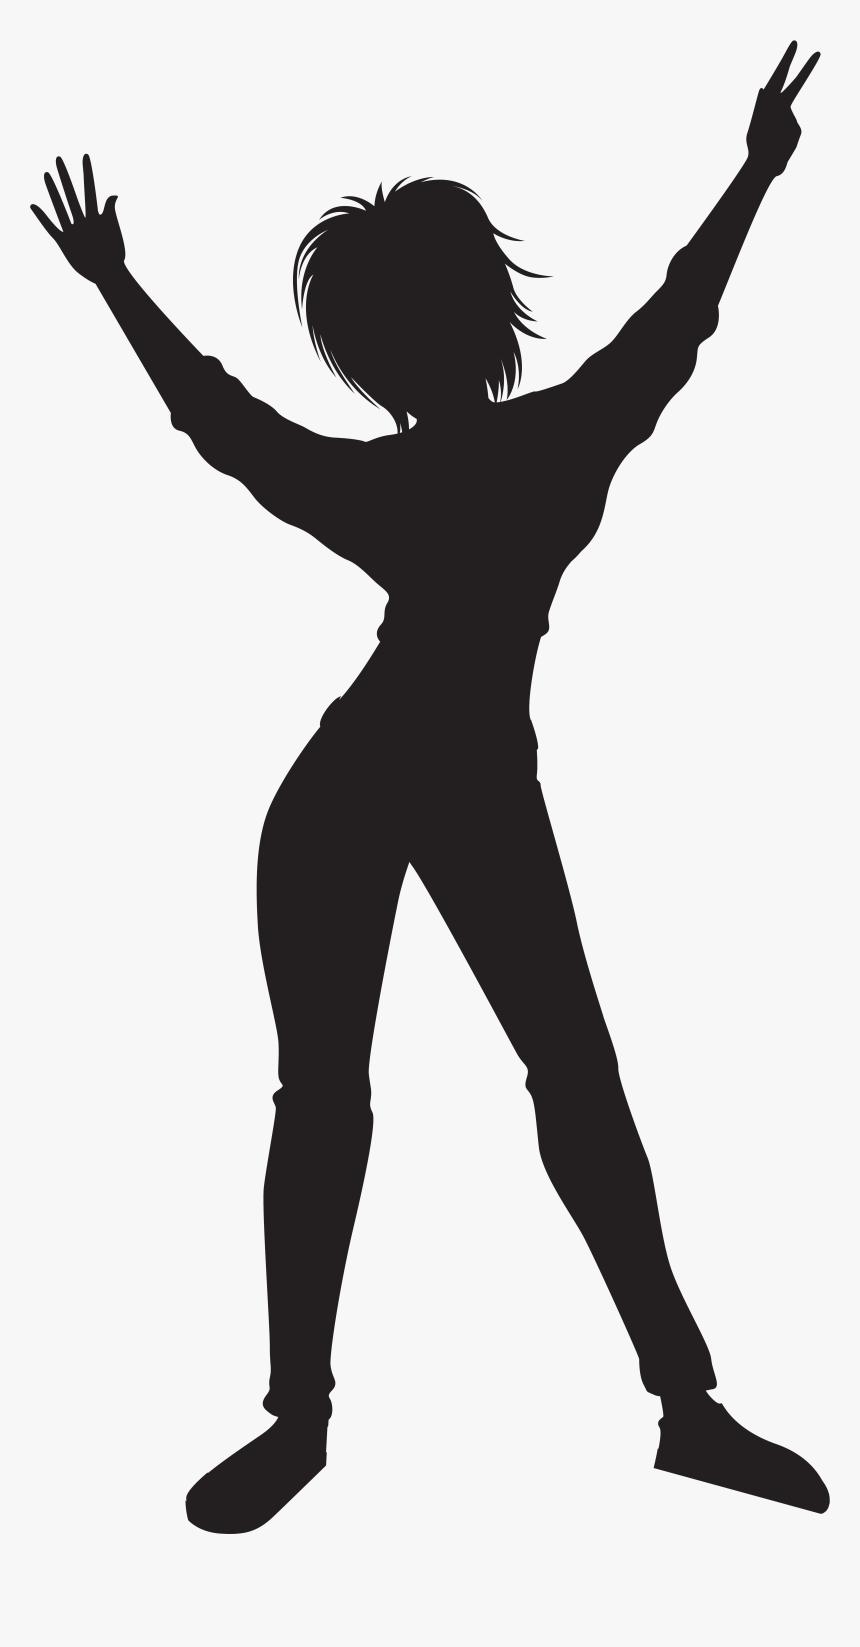 Dancing Girl Silhouette Png - Transparent Png Dancer Png, Png Download, Free Download